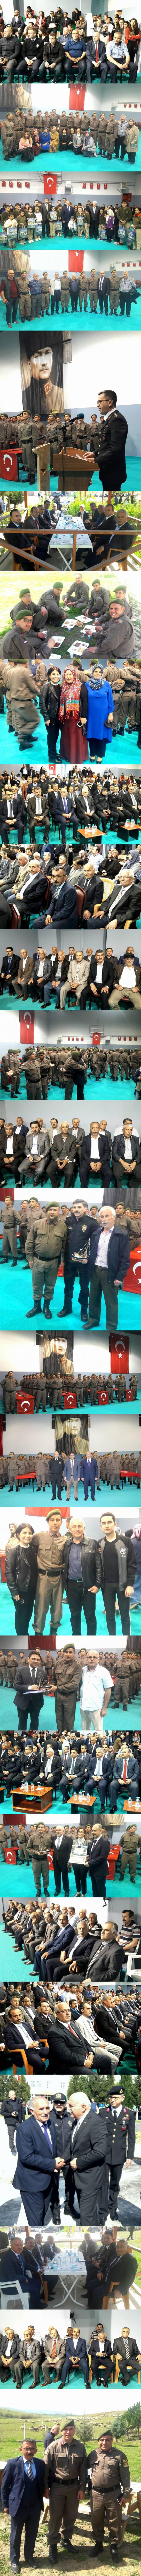 sarayduzu_asker_yenini3